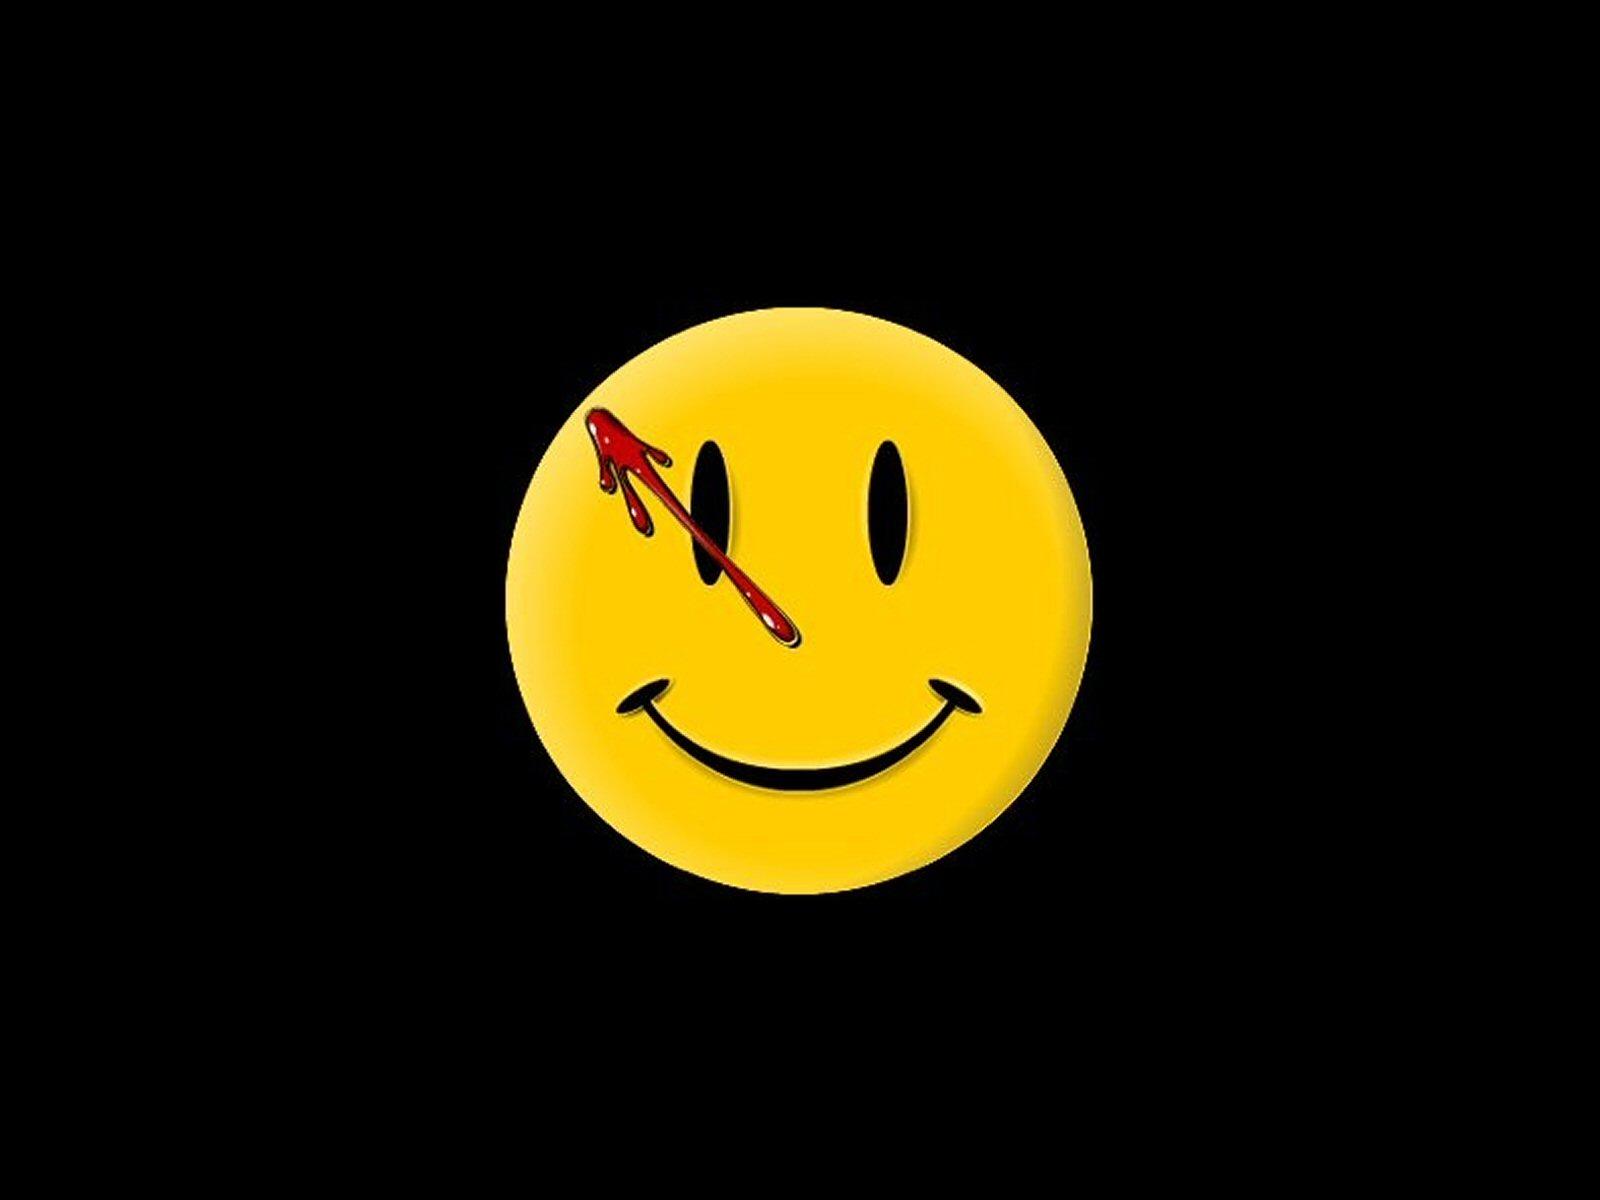 http://2.bp.blogspot.com/-PWAFnzxU7RI/T9GKMH8yWOI/AAAAAAAAIhQ/YdHR5XwB2O4/s1600/smiley-face-wallpaper-017.jpg